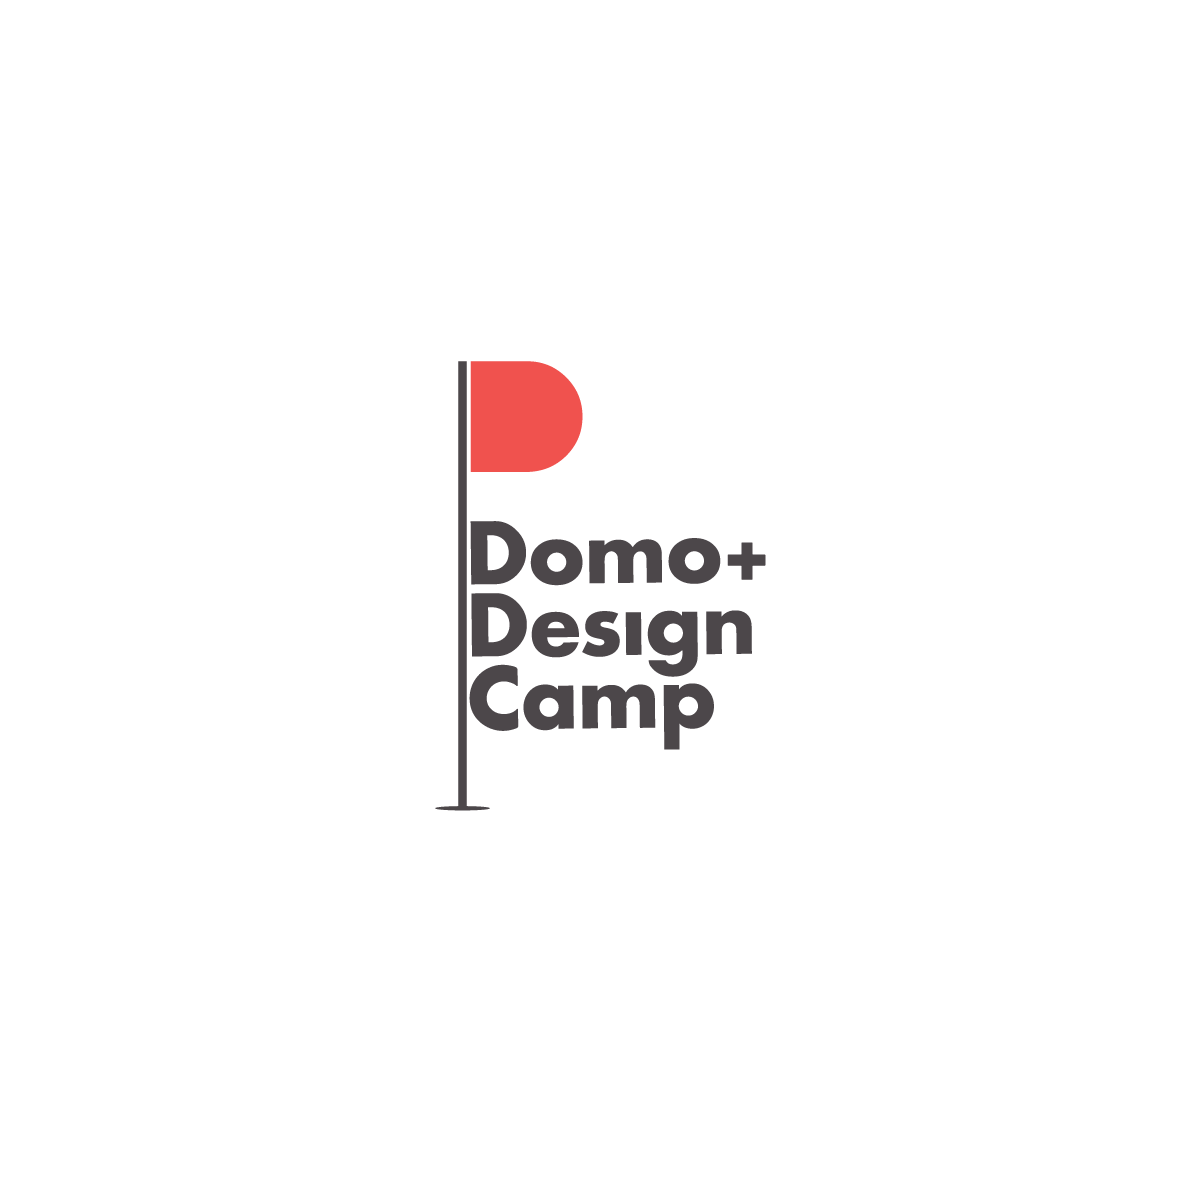 RUSZA NABÓR NA DOMO+ DESIGN CAMP